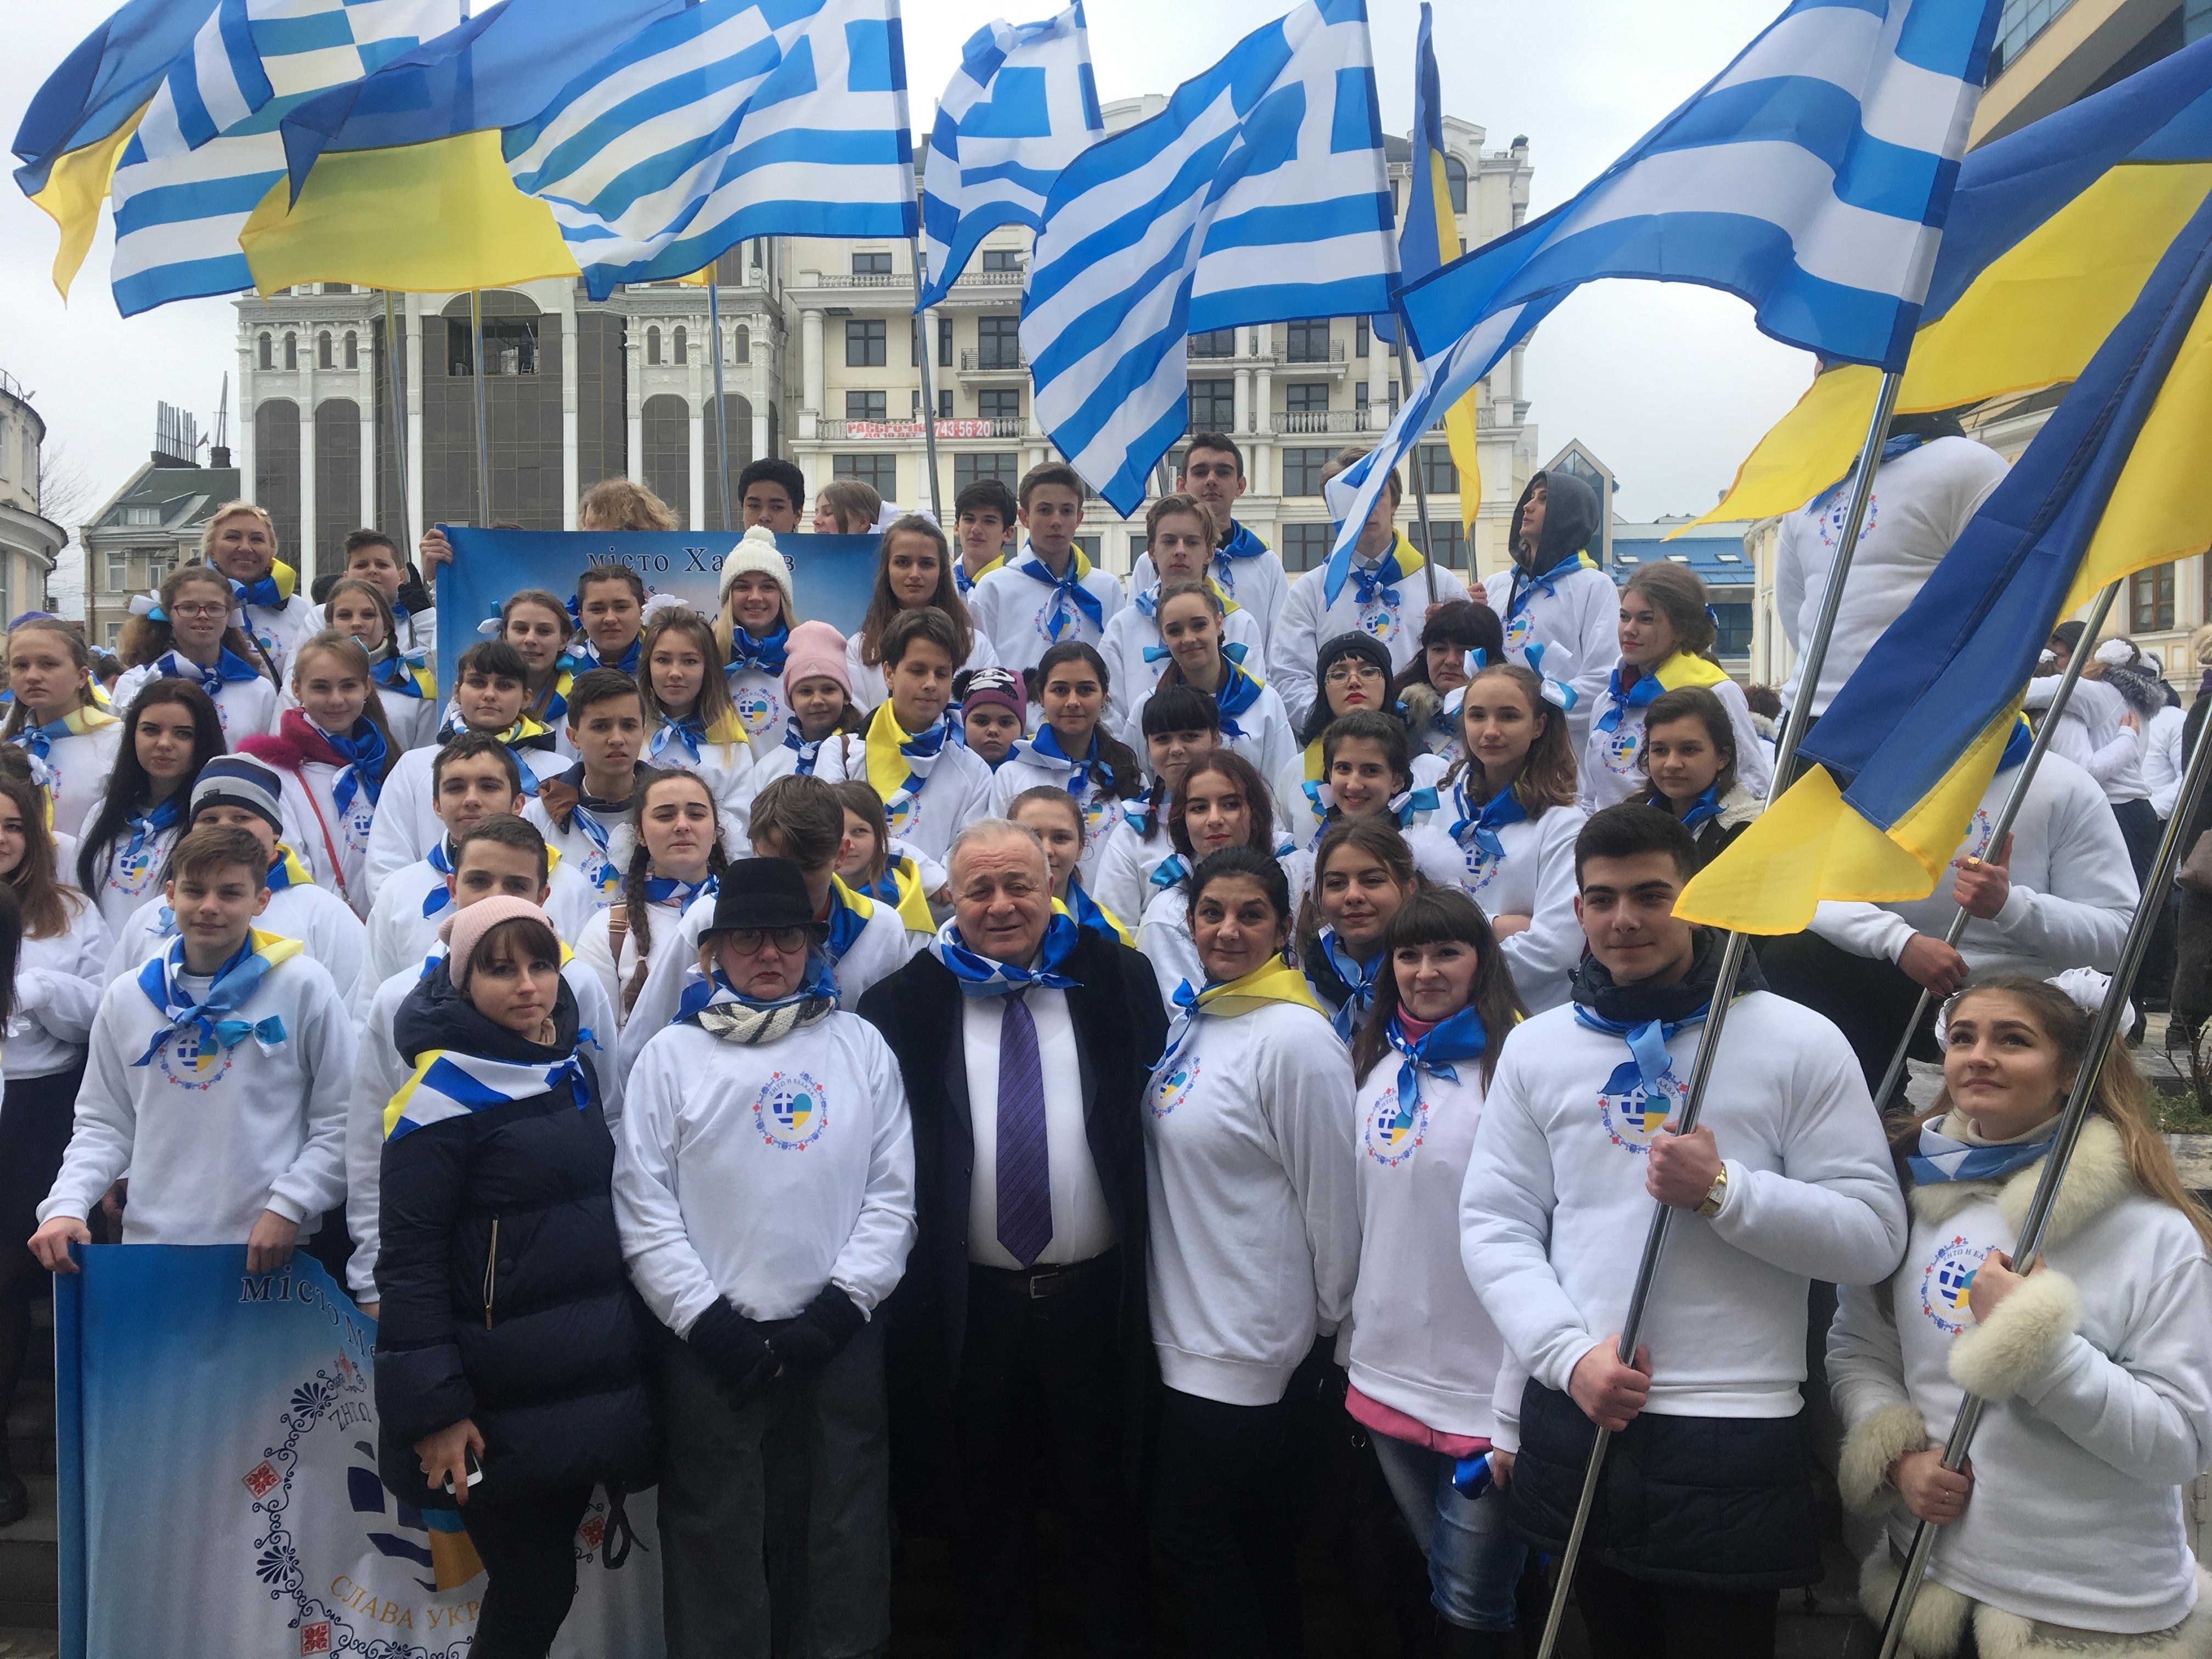 O Πρόεδρος του Ιδρύματος Μπούμπουρα κ. Παντελής Μπούμπουρας με τους μαθητές των ελληνόφωνων σχολείων της Ουκρανίας